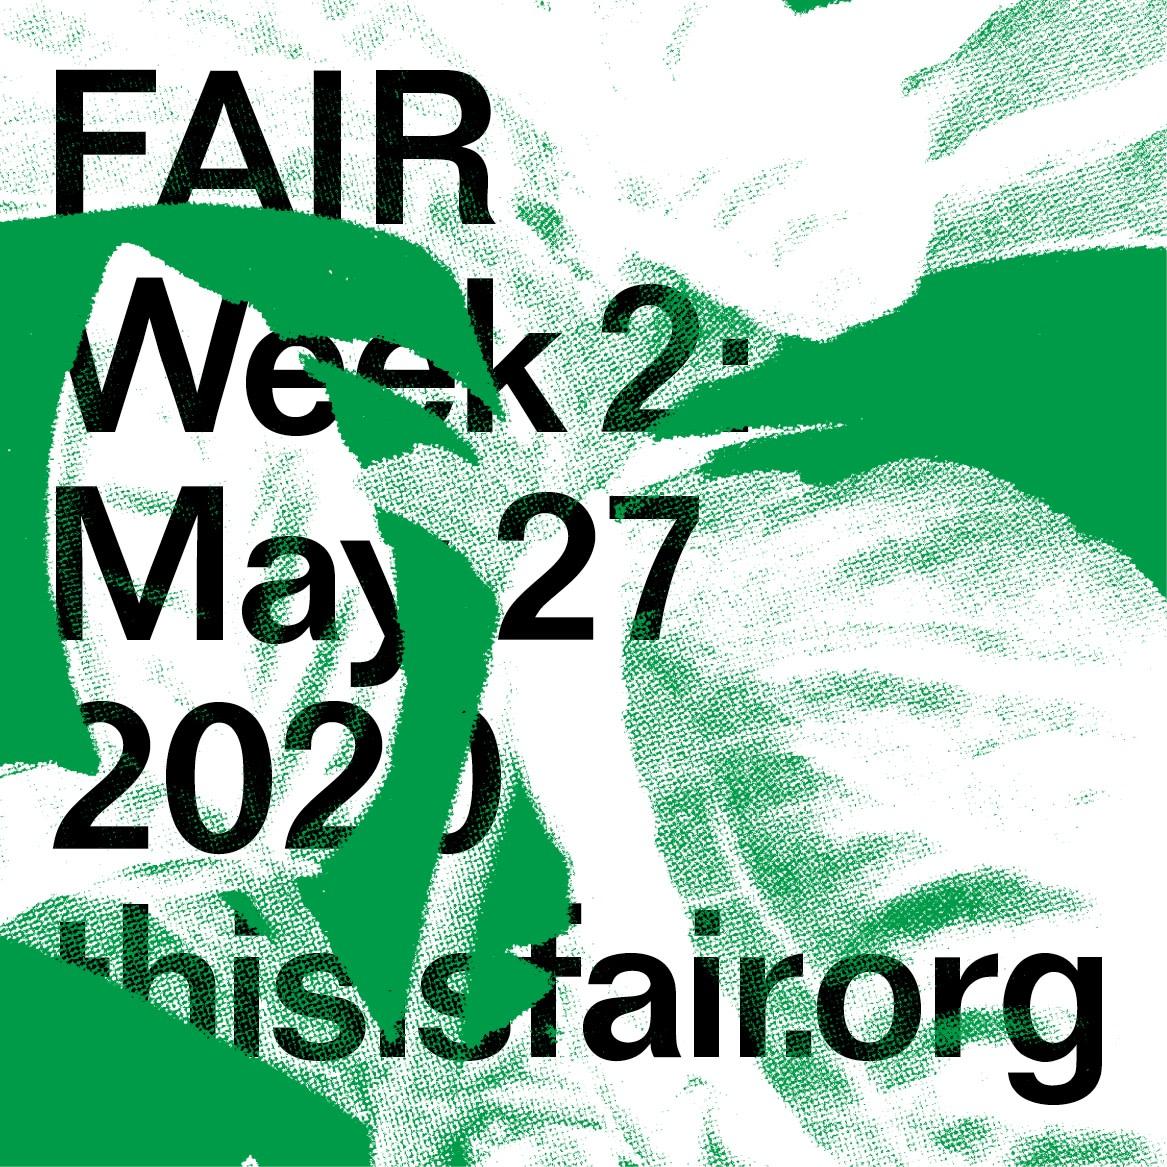 FAIR Week 2: May 27, 2020